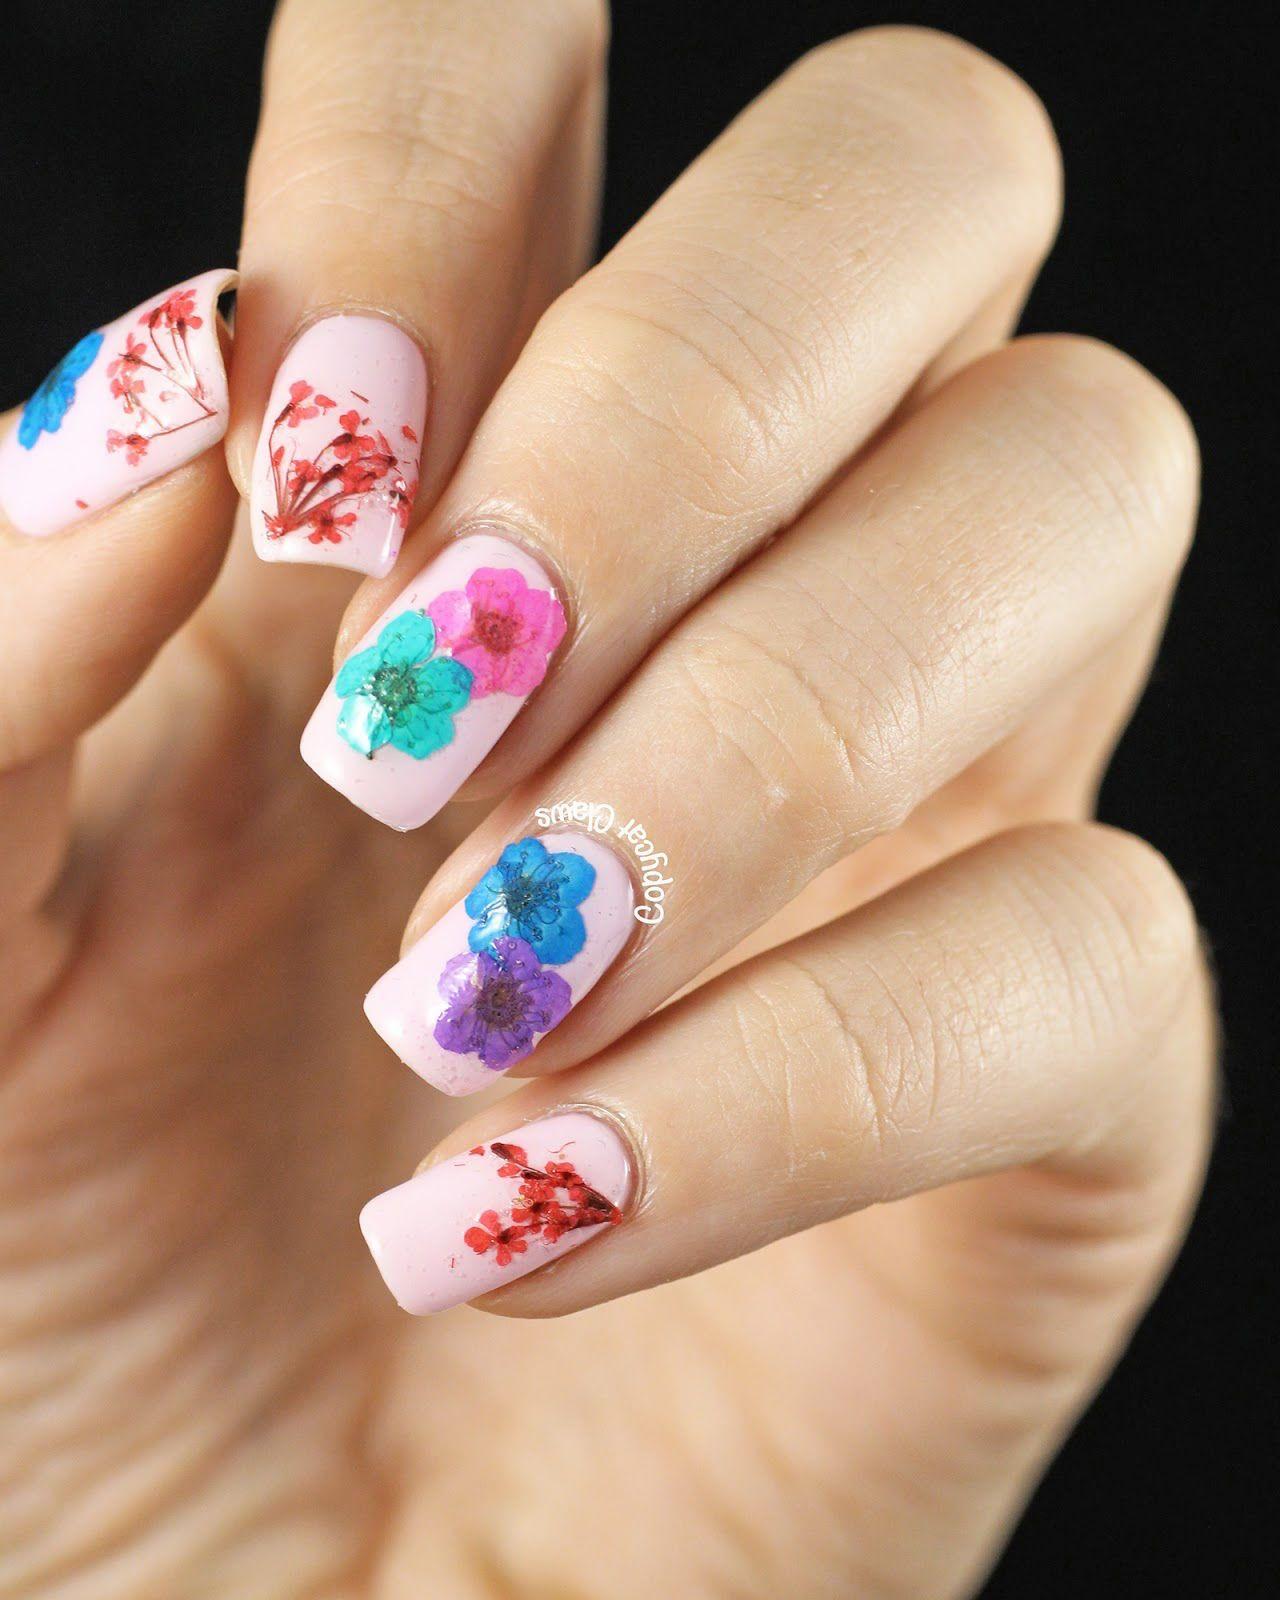 20 Super Pretty Floral Nail Designs Flower Nail Art Flower Nails